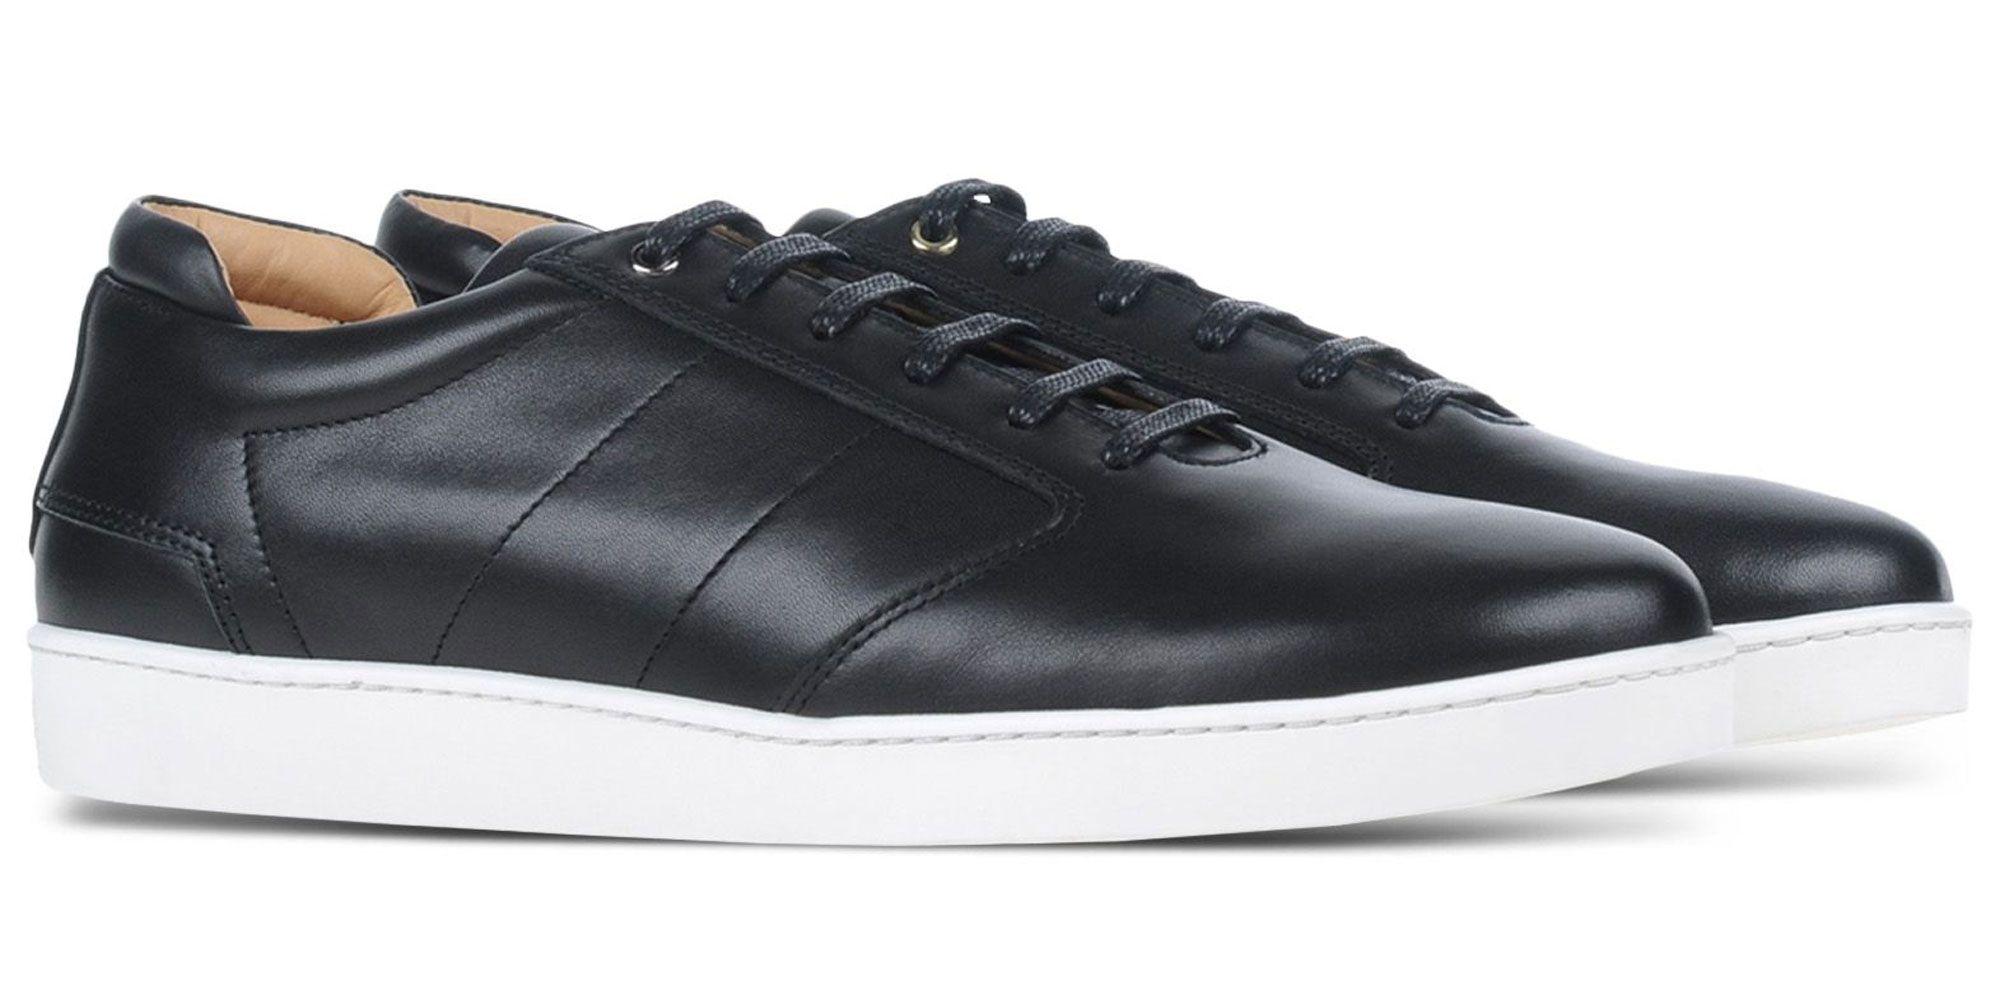 Want Les Essentiels White Intrecciato Sneakers lP3Nn0